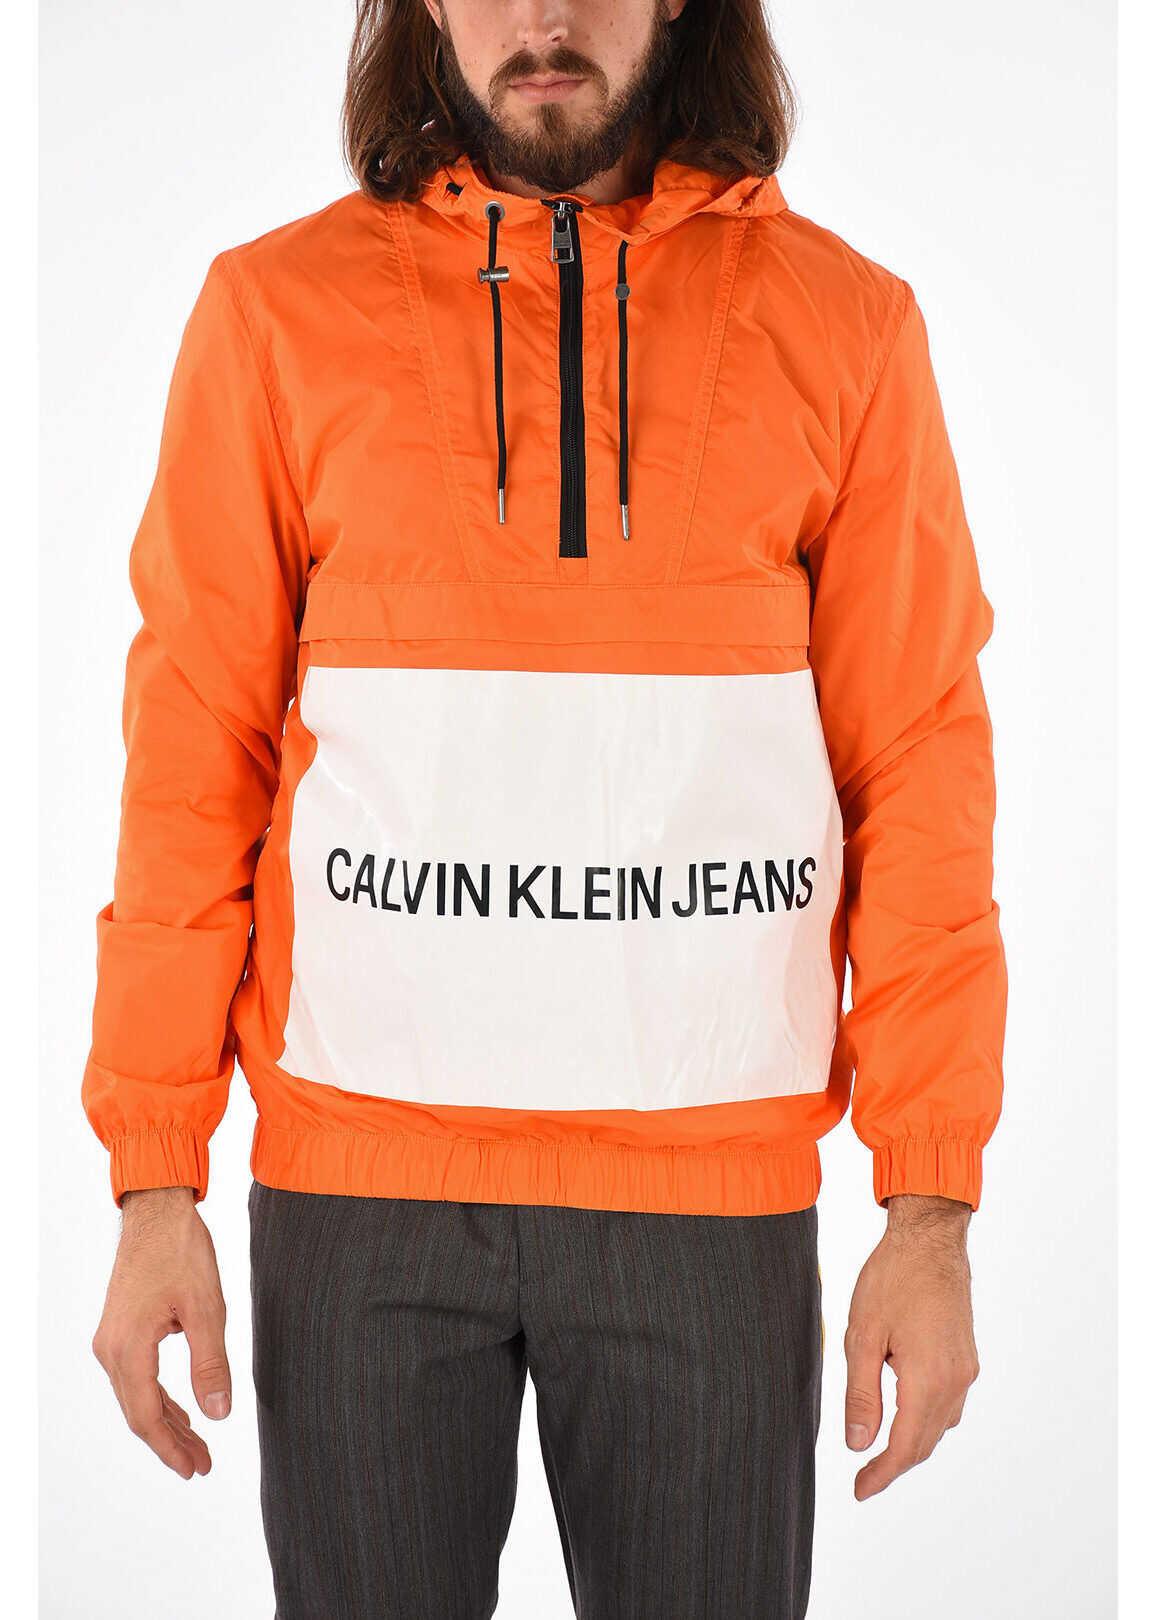 Calvin Klein JEANS EST. 1978 Hooded Nylon Jacket ORANGE